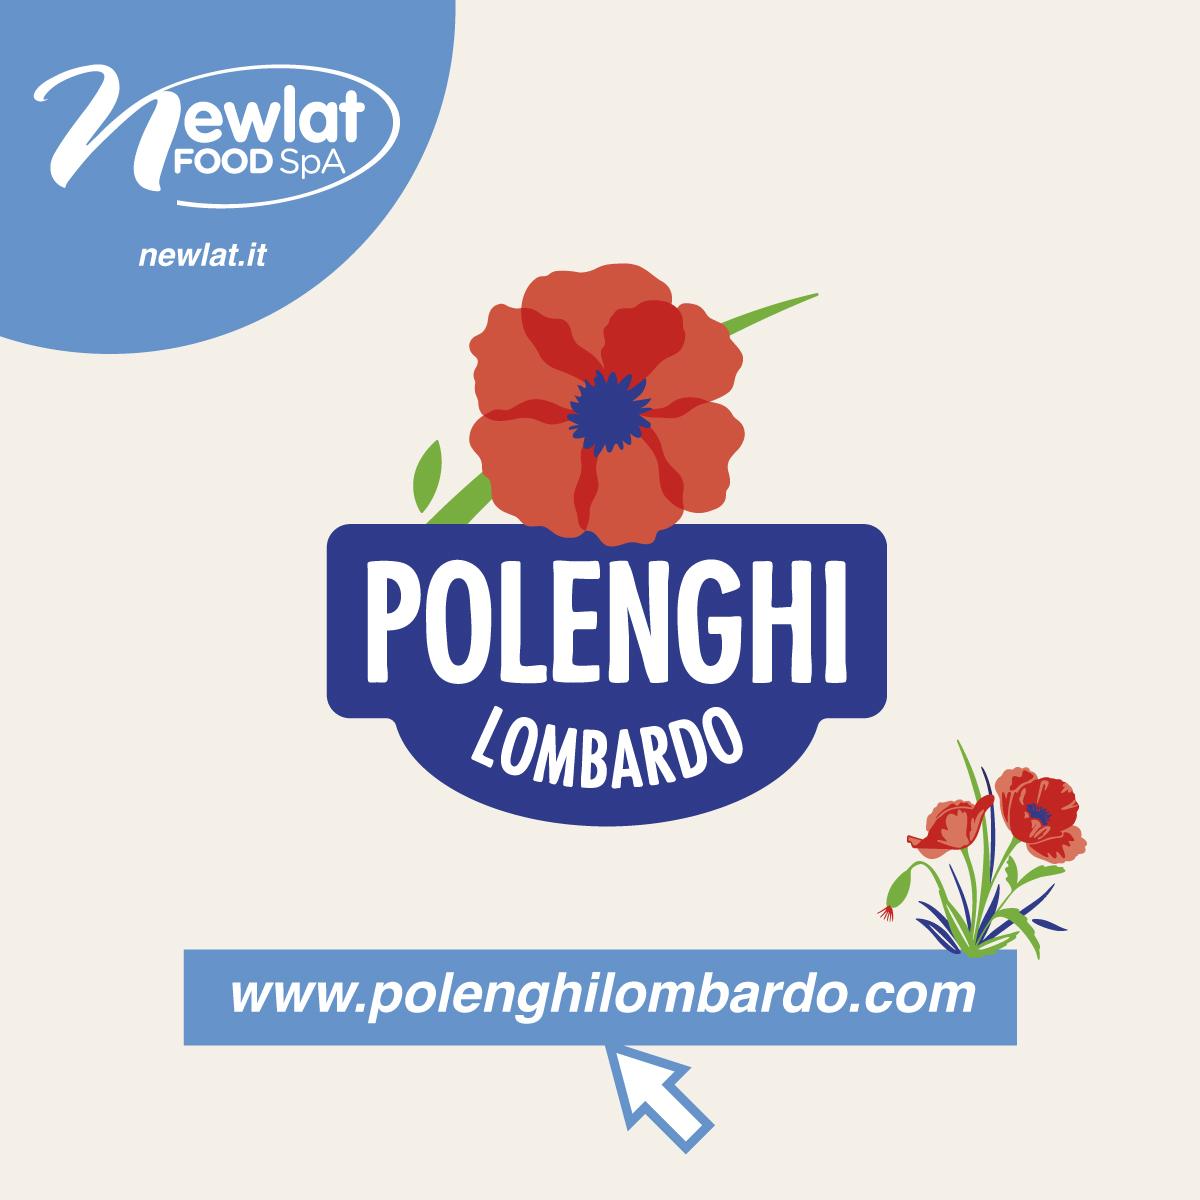 POLENGHI LOMBARDO